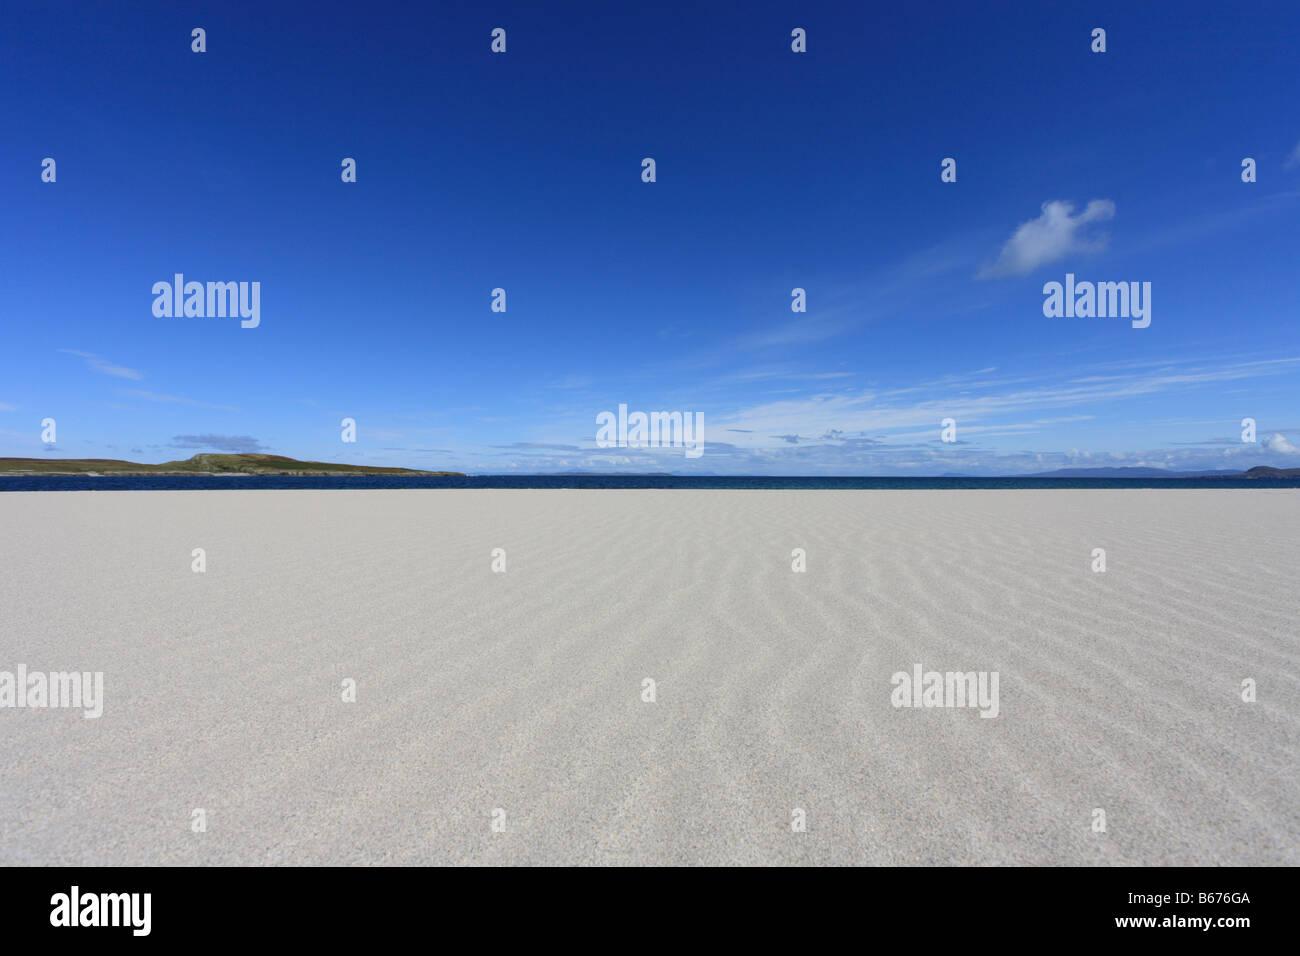 Ardnave beach 'Deserted beach' Scotland summer, 'Islay' - Stock Image